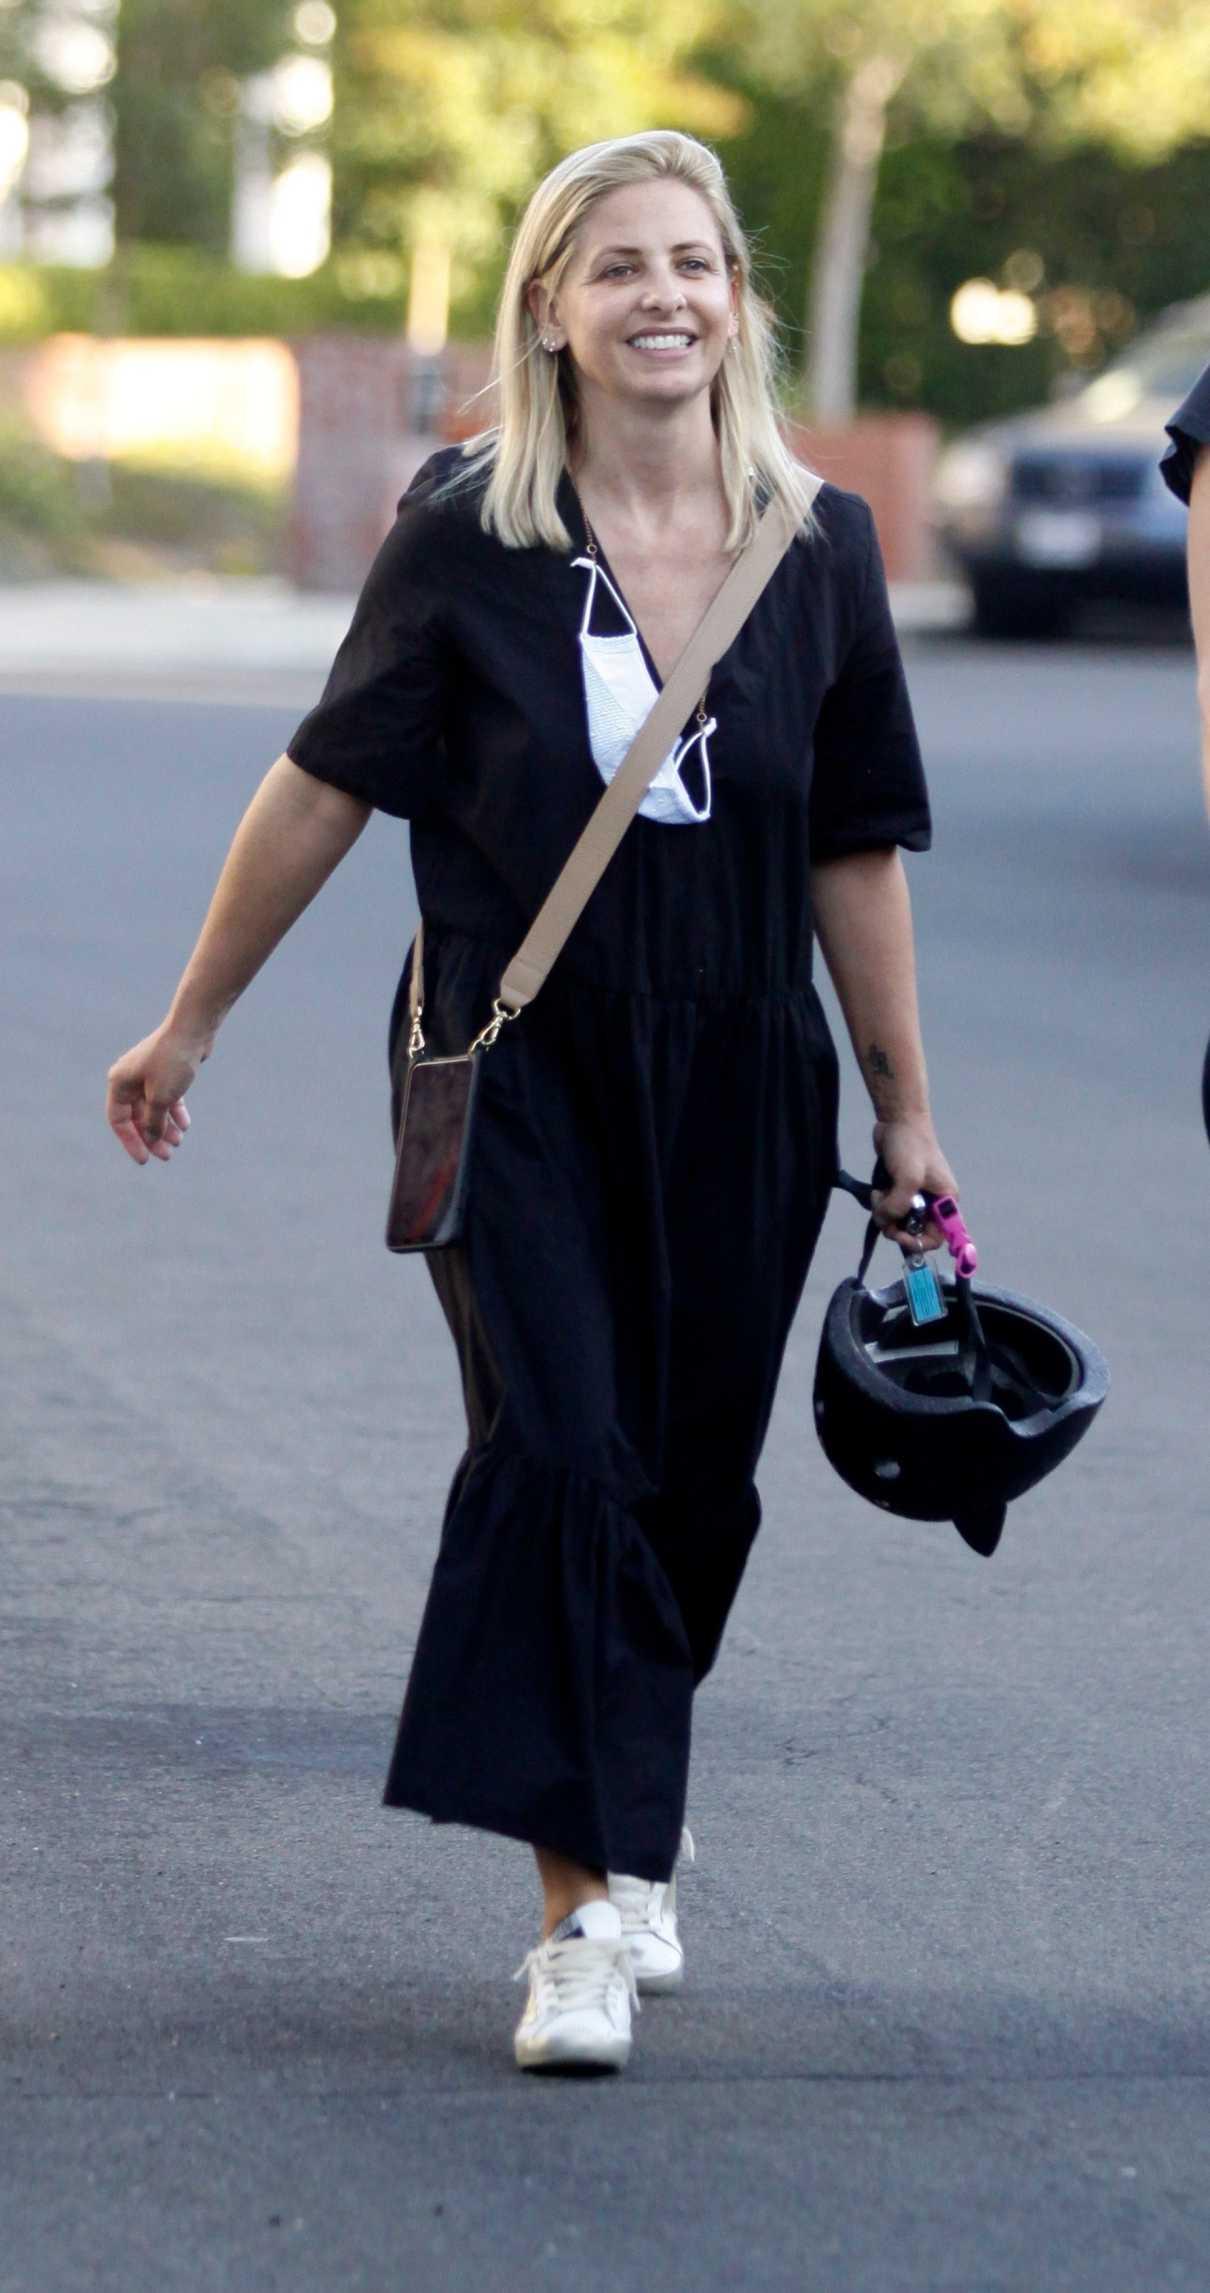 Sarah Michelle Gellar in a Black Dress